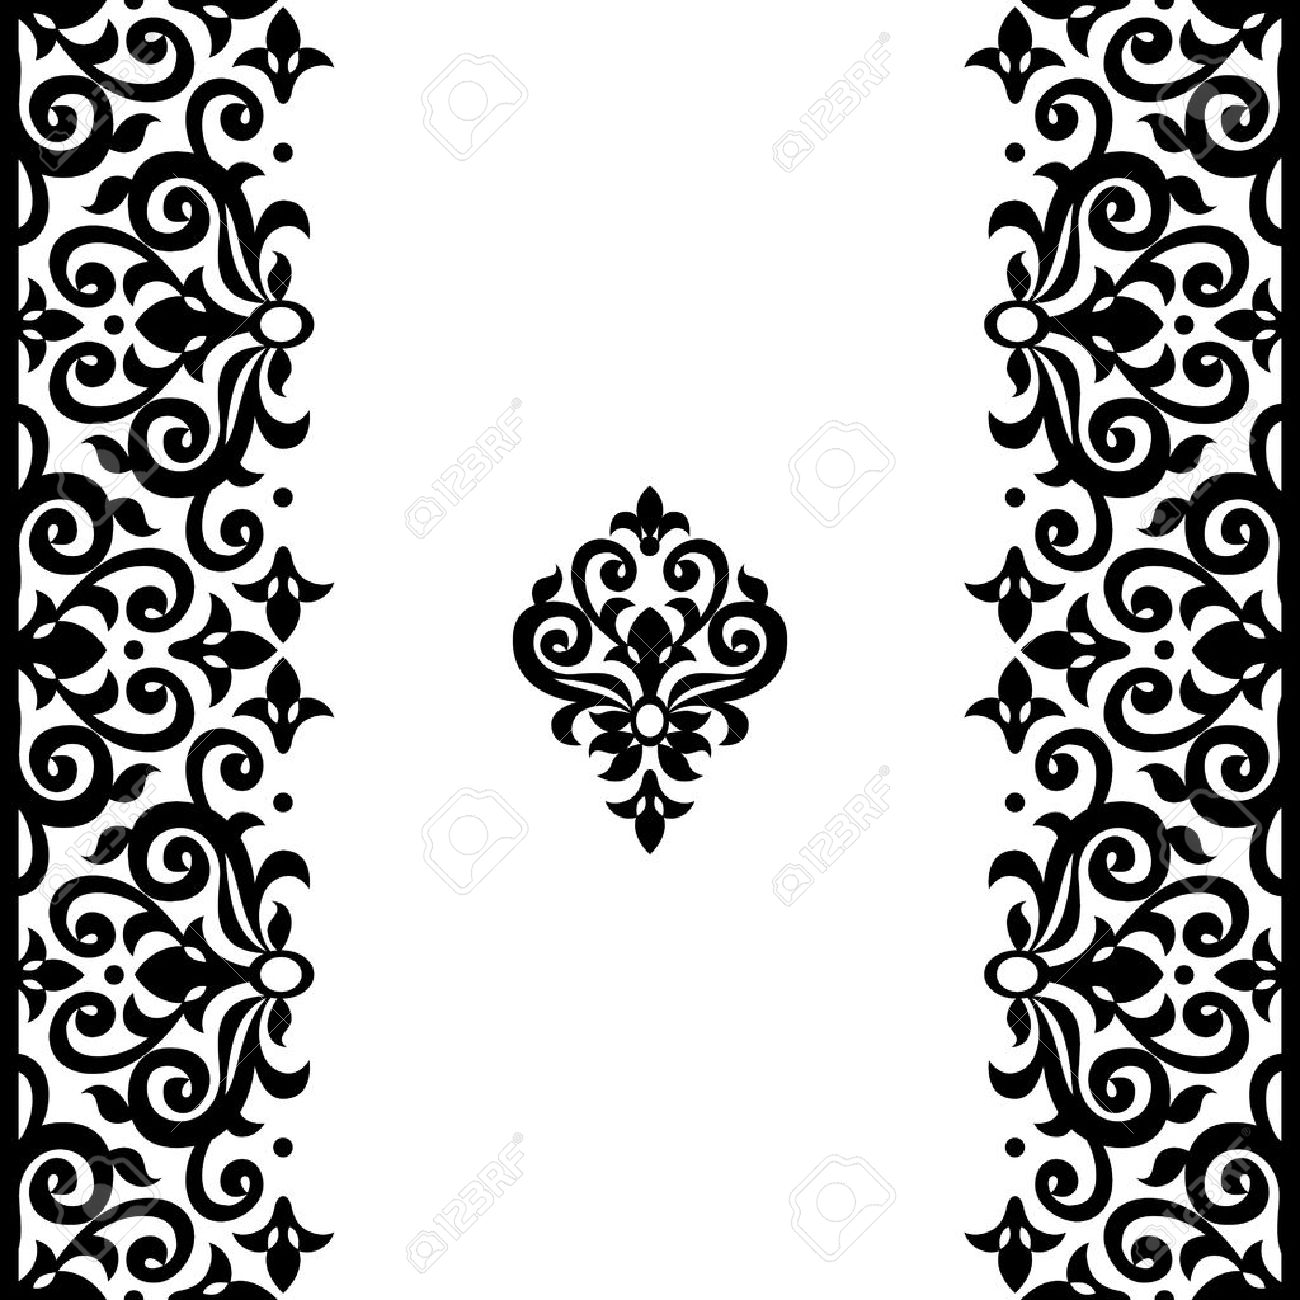 Niedlich Viktorianisch Spitzehäkelarbeit Muster Bilder - Nähmuster ...